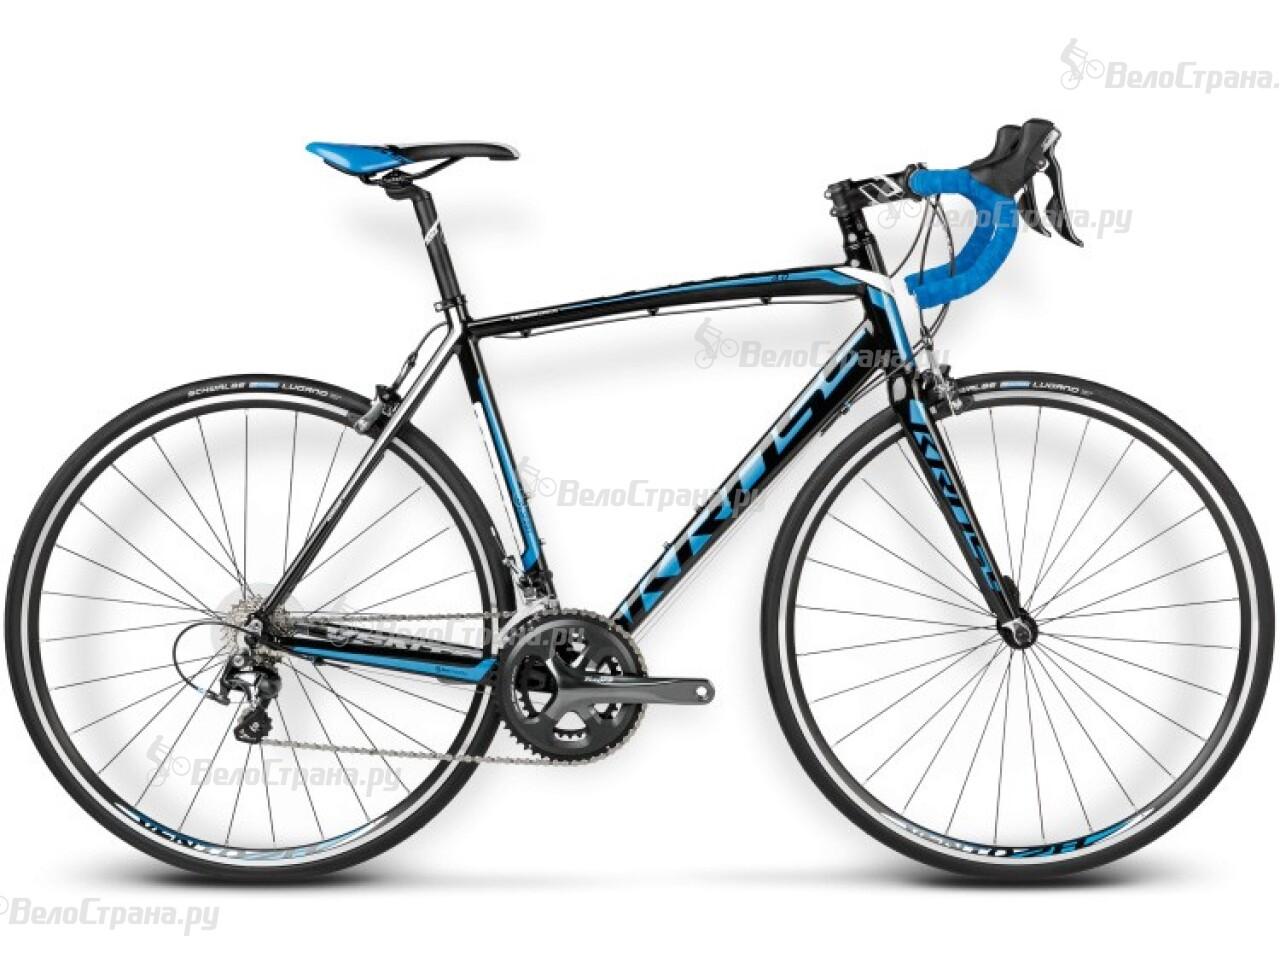 Велосипед Kross VENTO 4.0 (2016) велосипед kross lea f2 2016